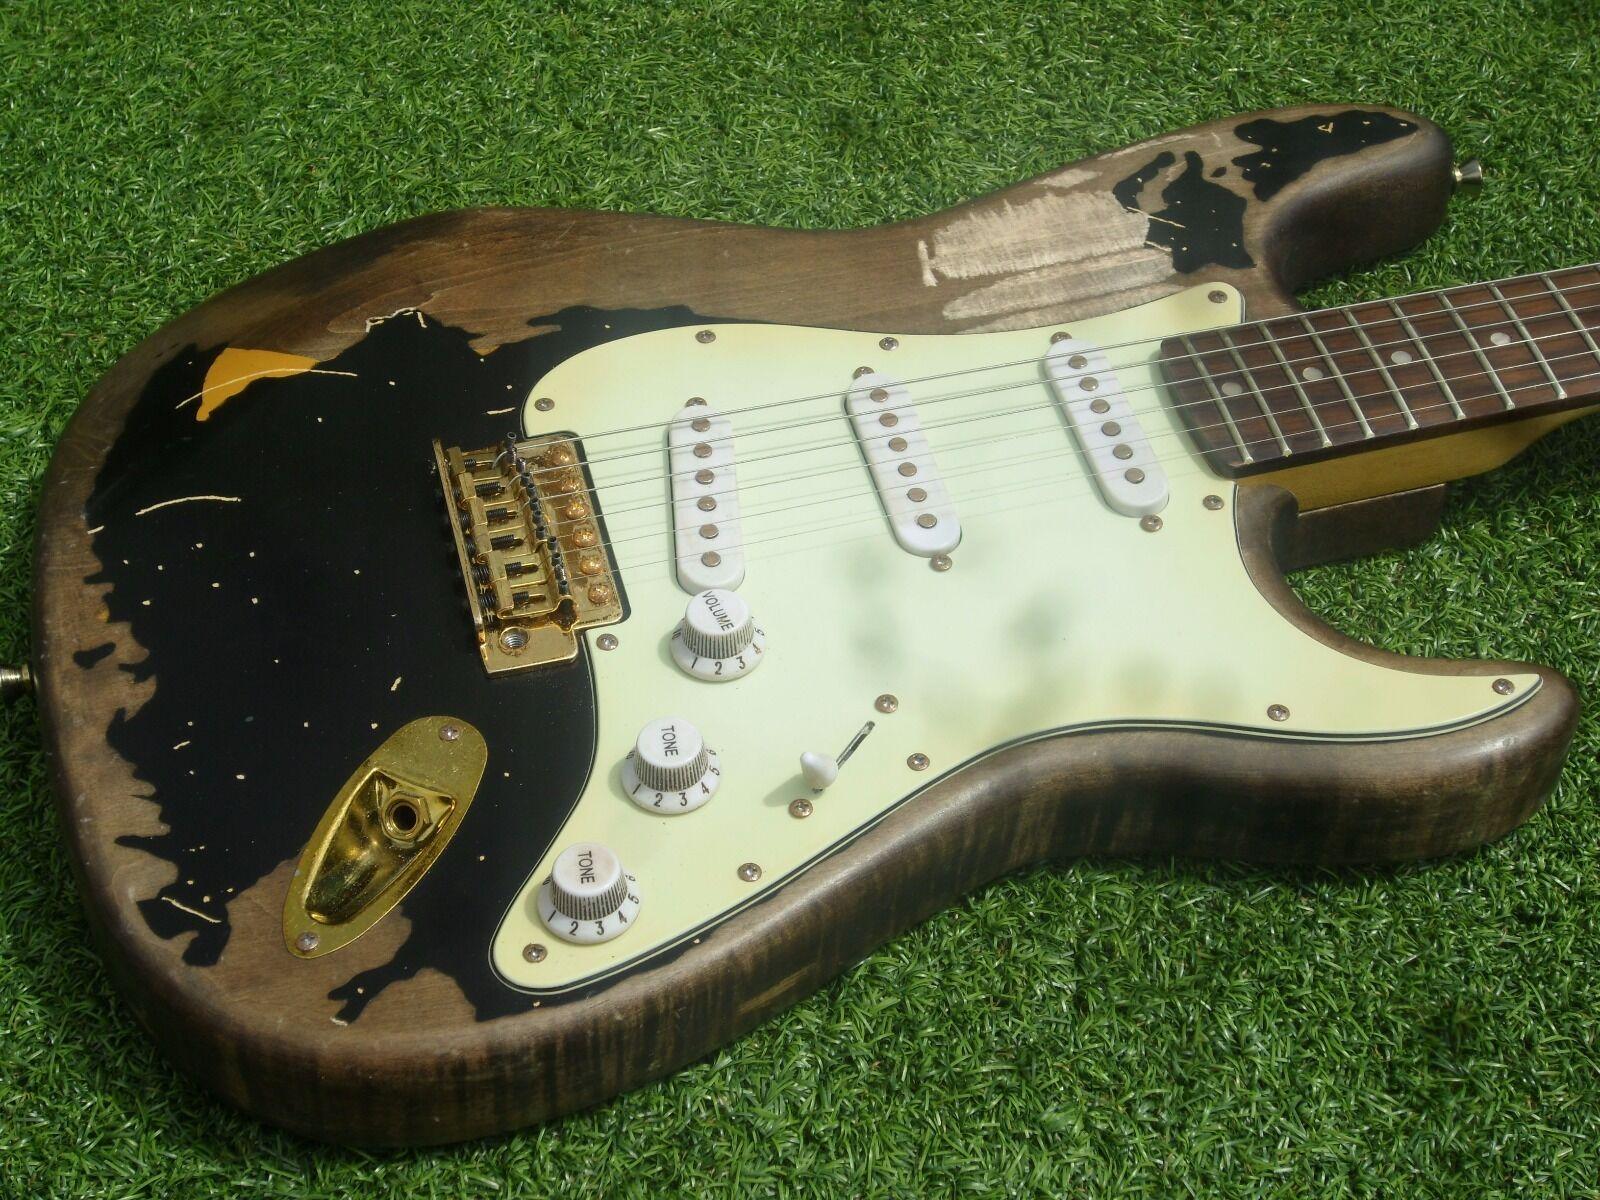 DY Guitars John Mayer relic strat guitar schwarz1 schwarz 1 Blk1